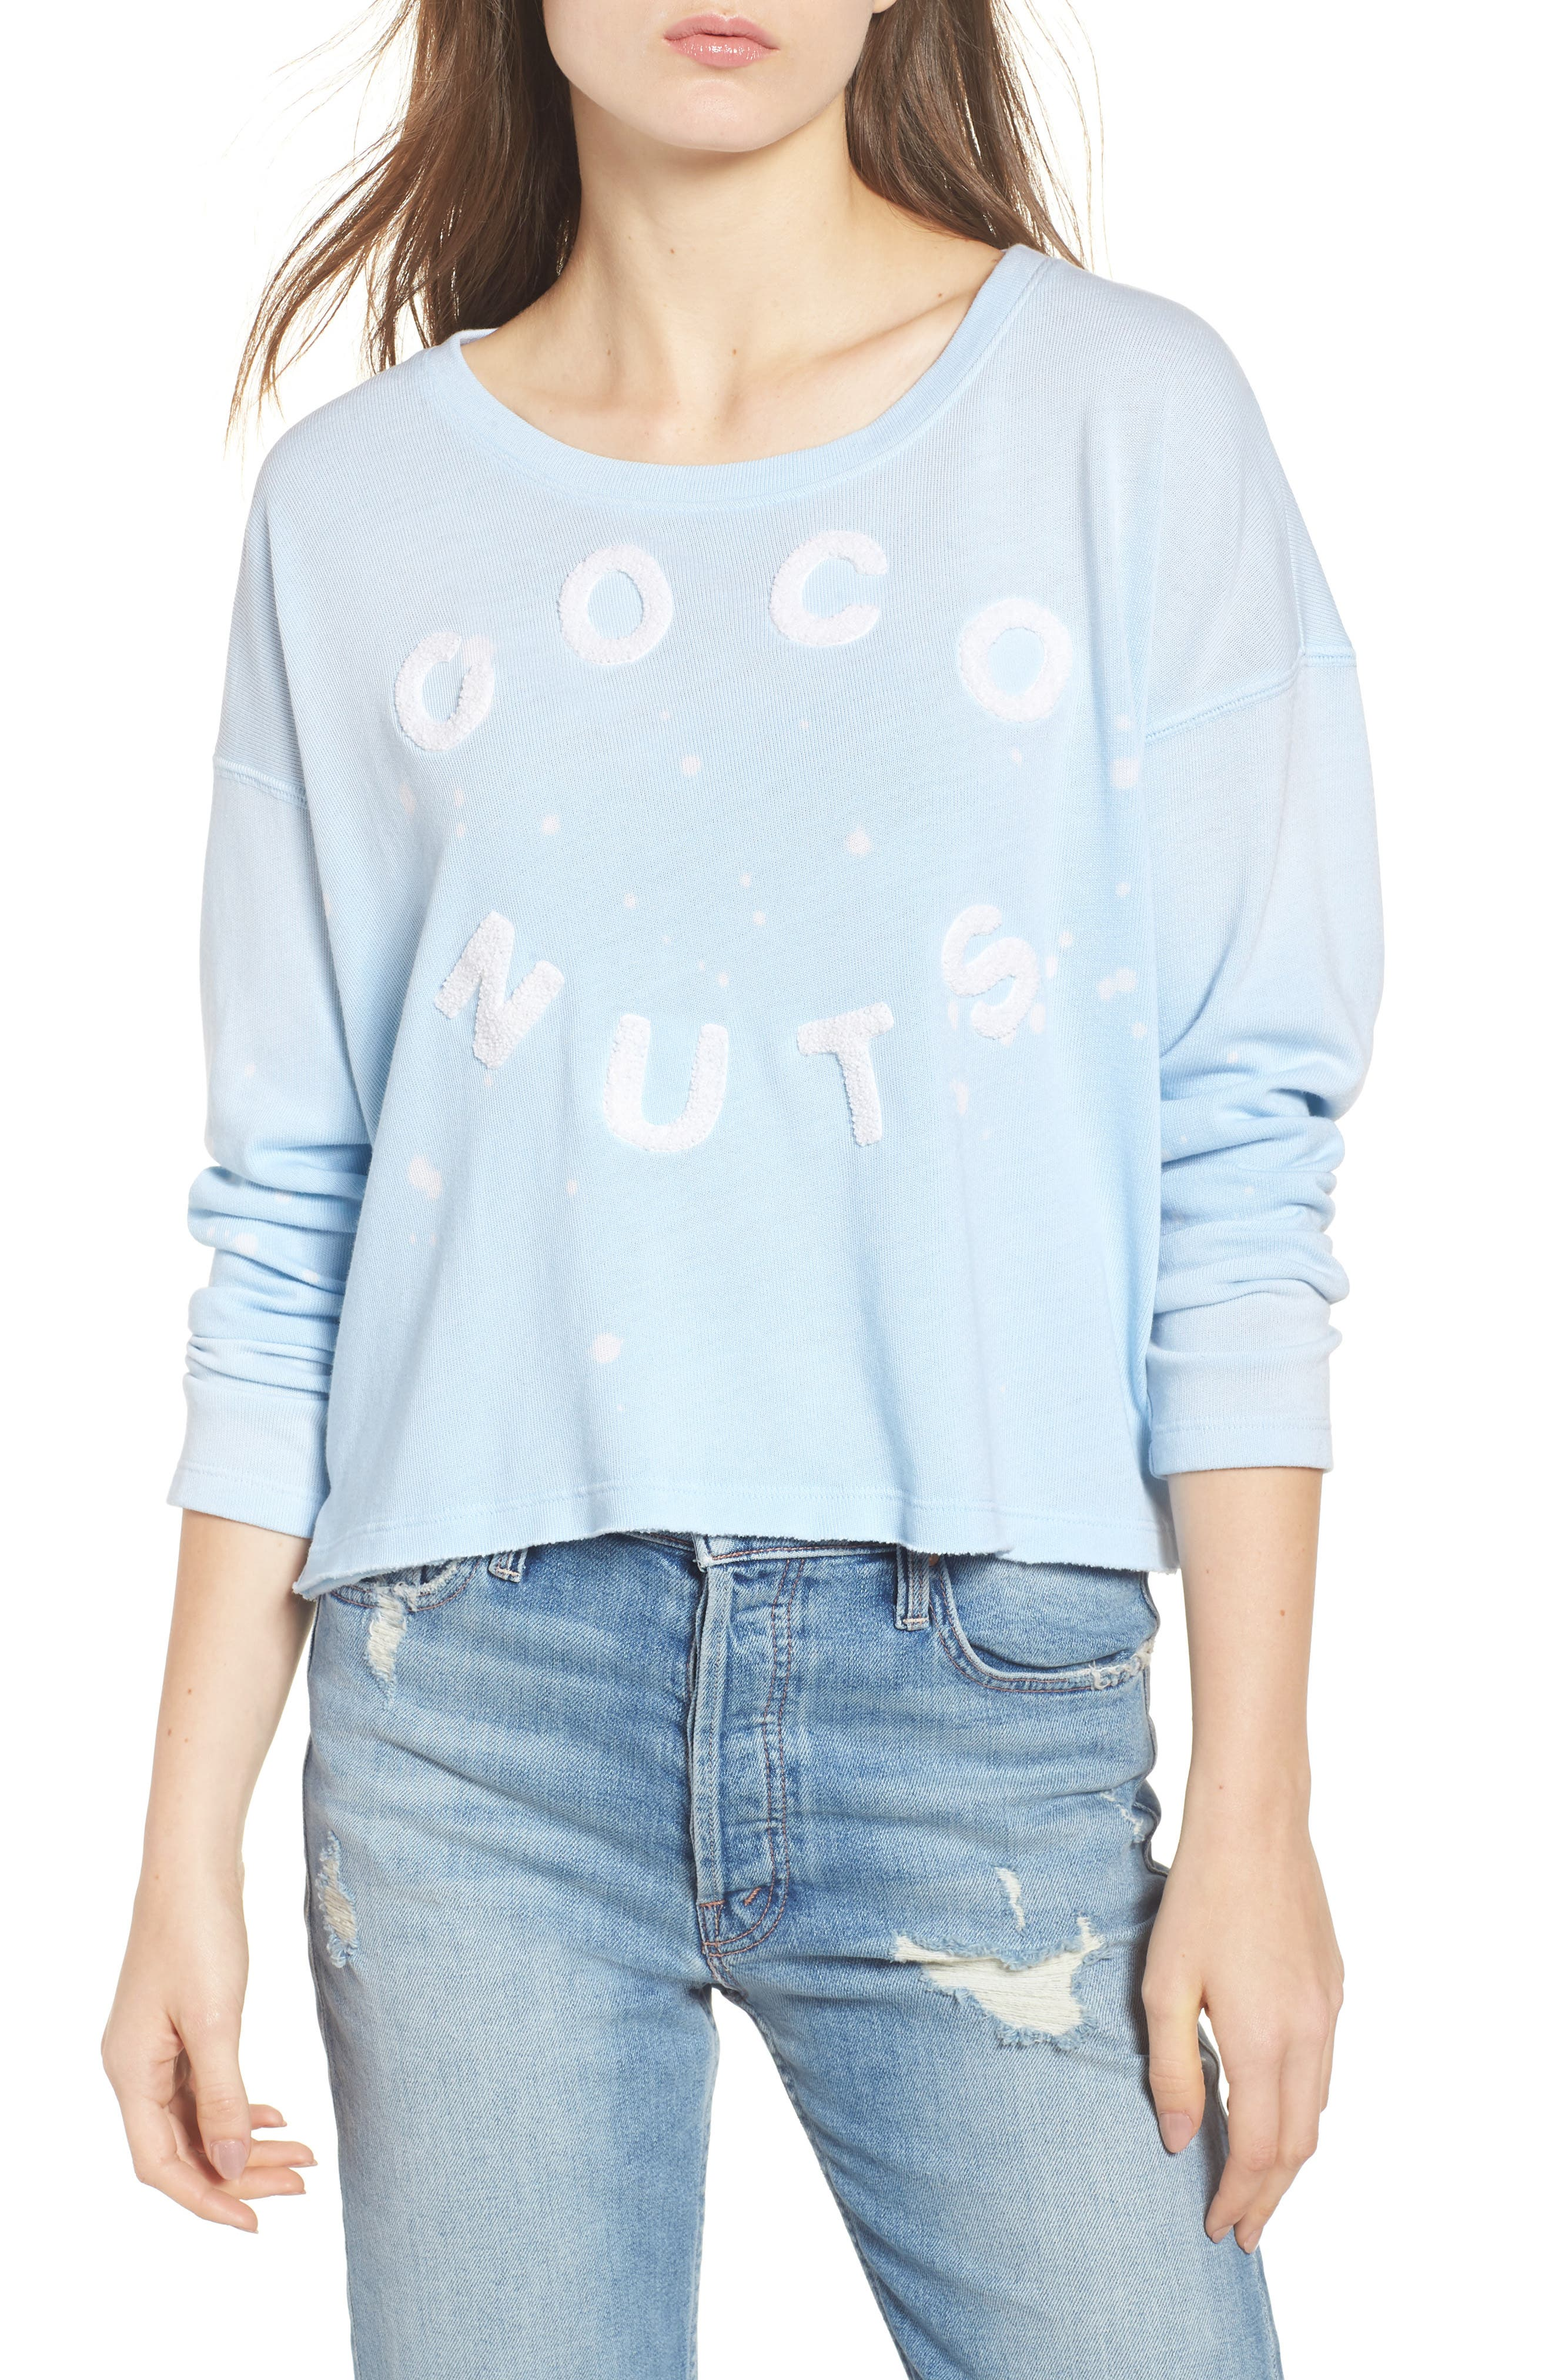 Coco Nuts Light Fleece Sweatshirt,                             Main thumbnail 1, color,                             Sun Faded Sky